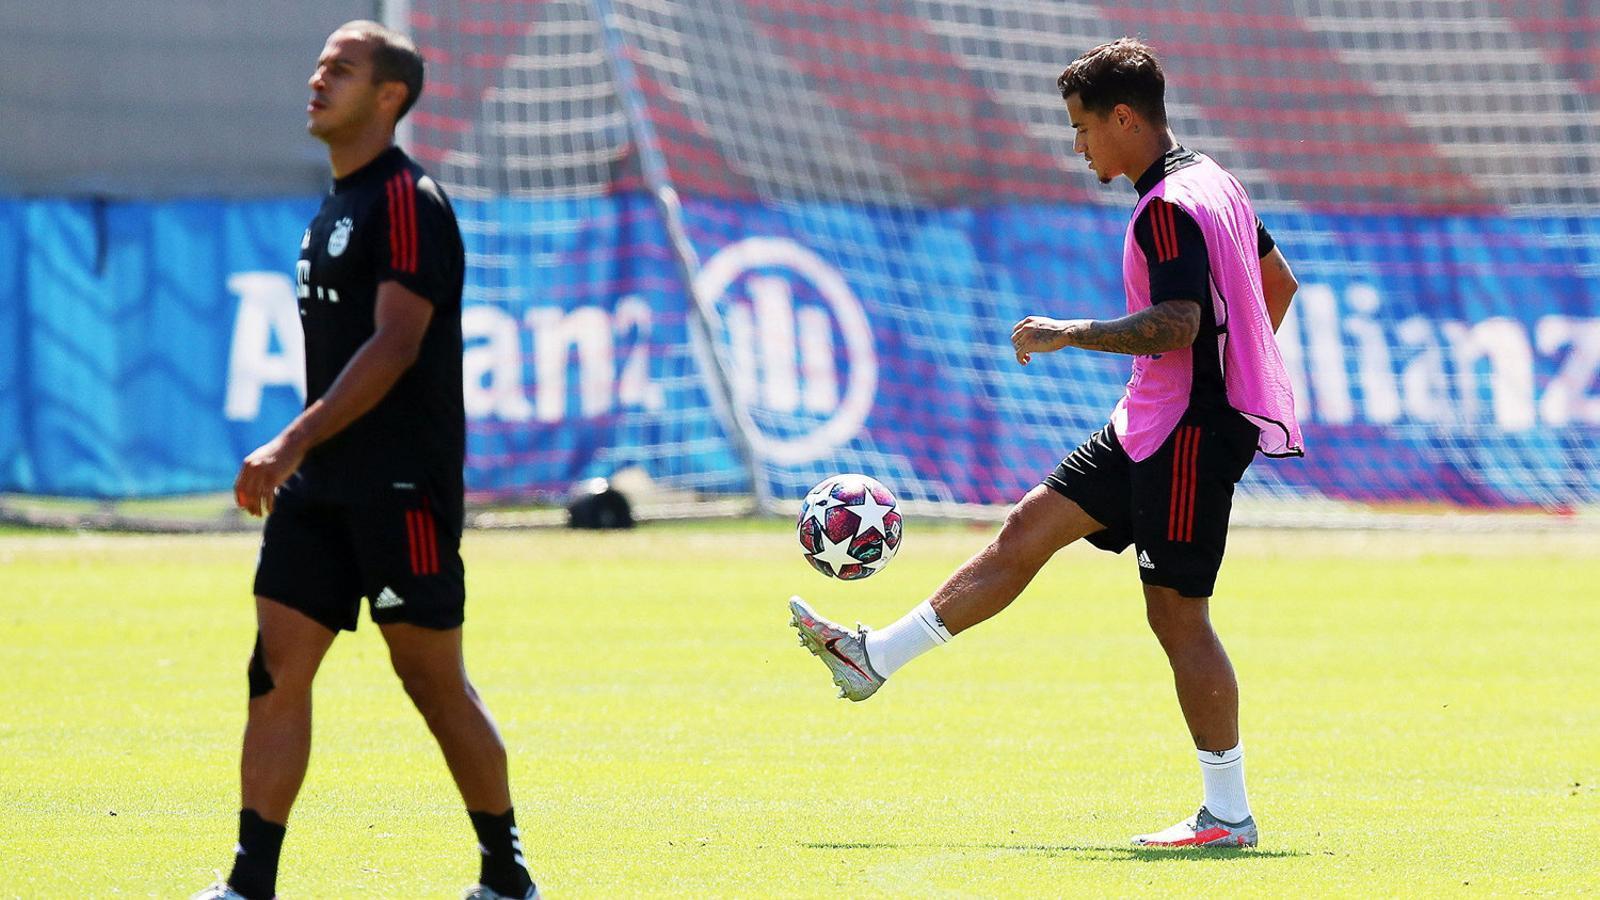 Coutinho entrenant a Portugal al costat de Thiago Alcántara.